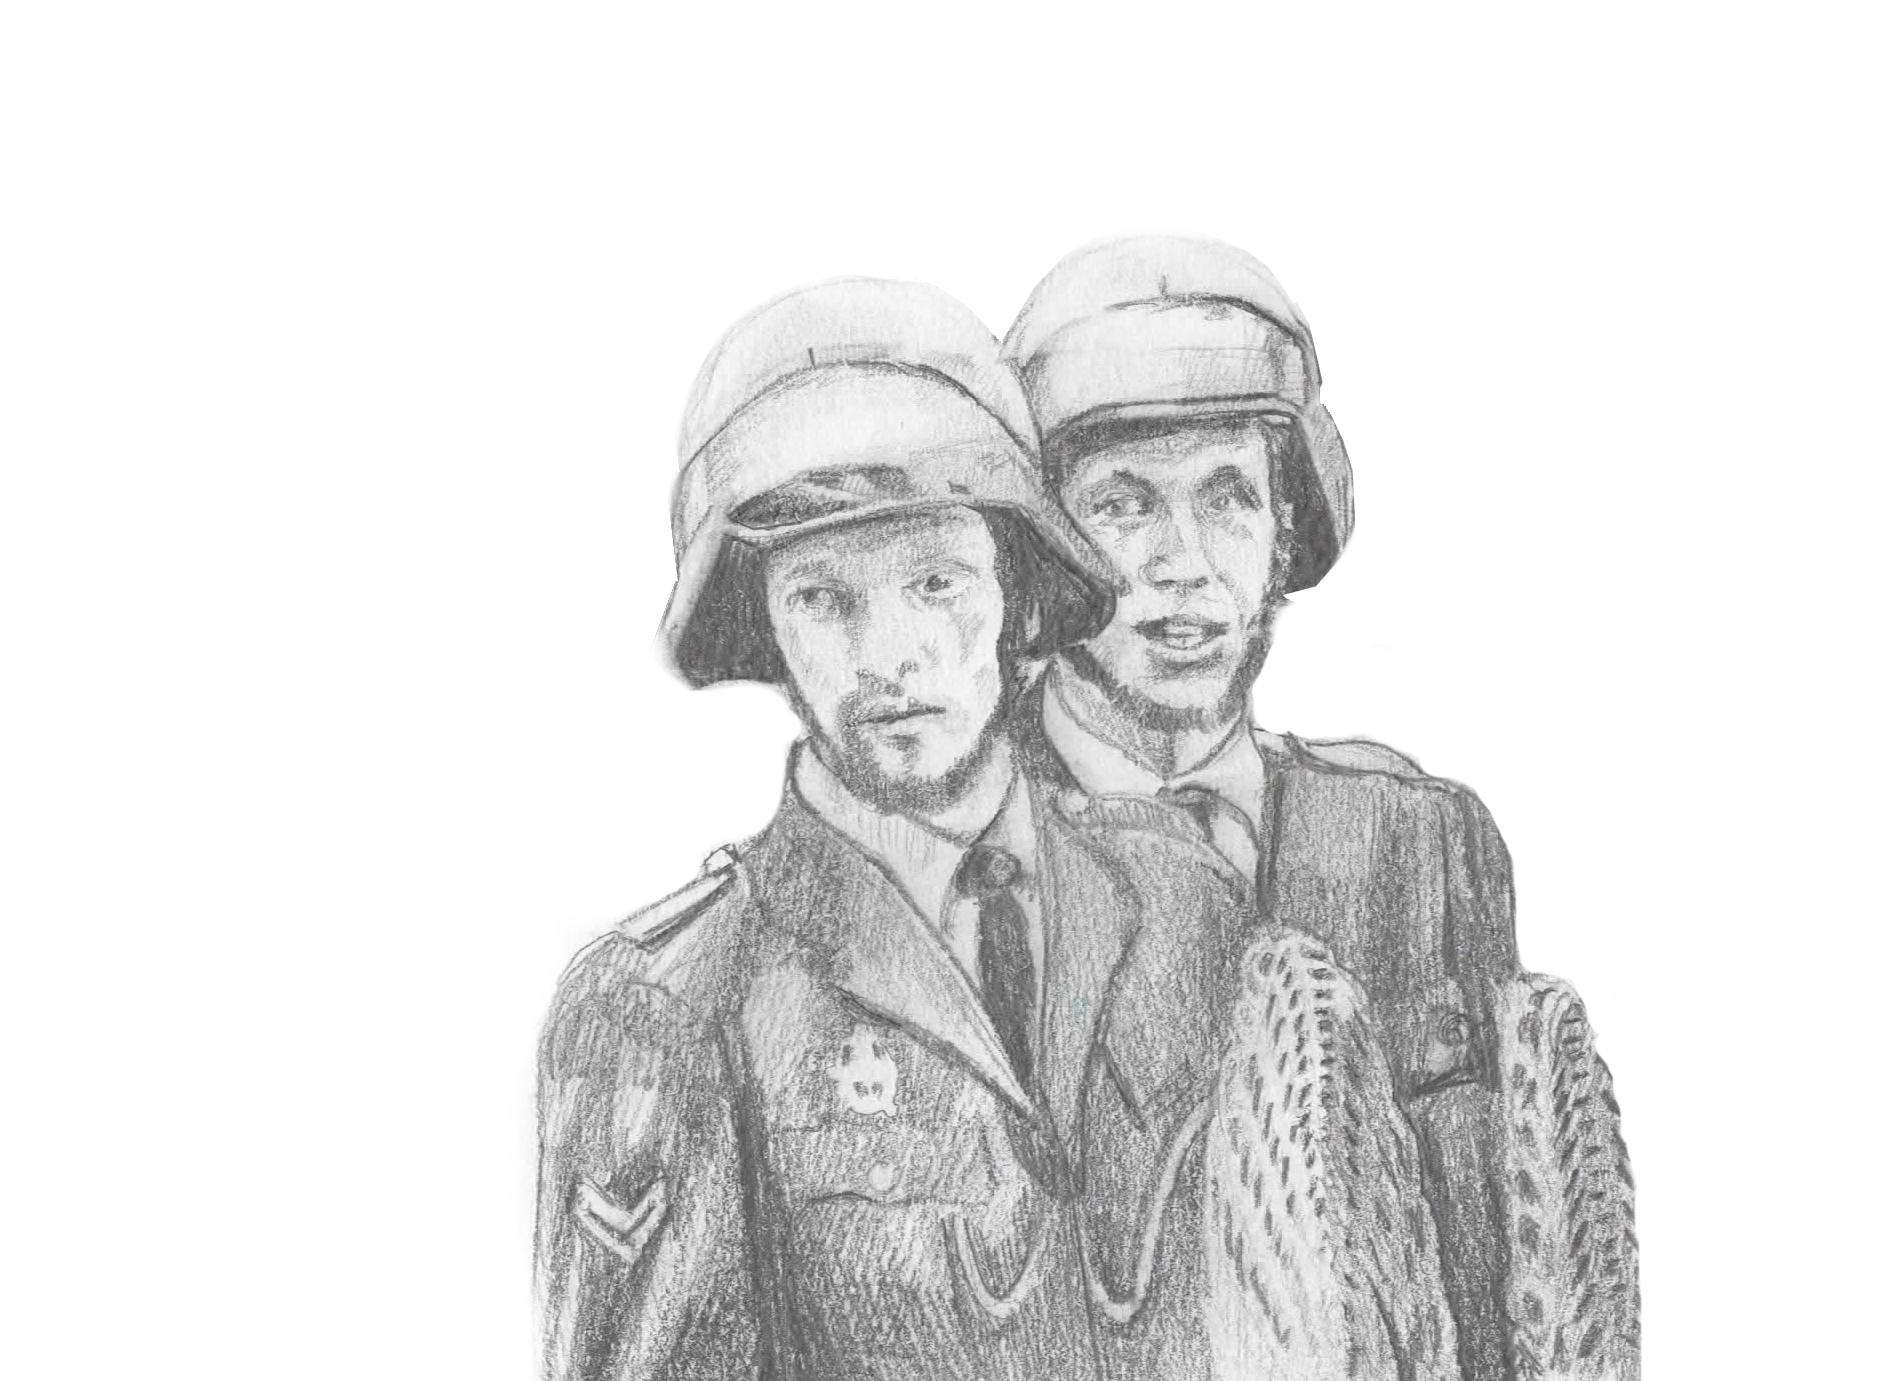 Community Member - Mobiele eenheid verwijdert woonwagenbewoners uit kamp Osdorp - wicker shields - William Diepraam 1973